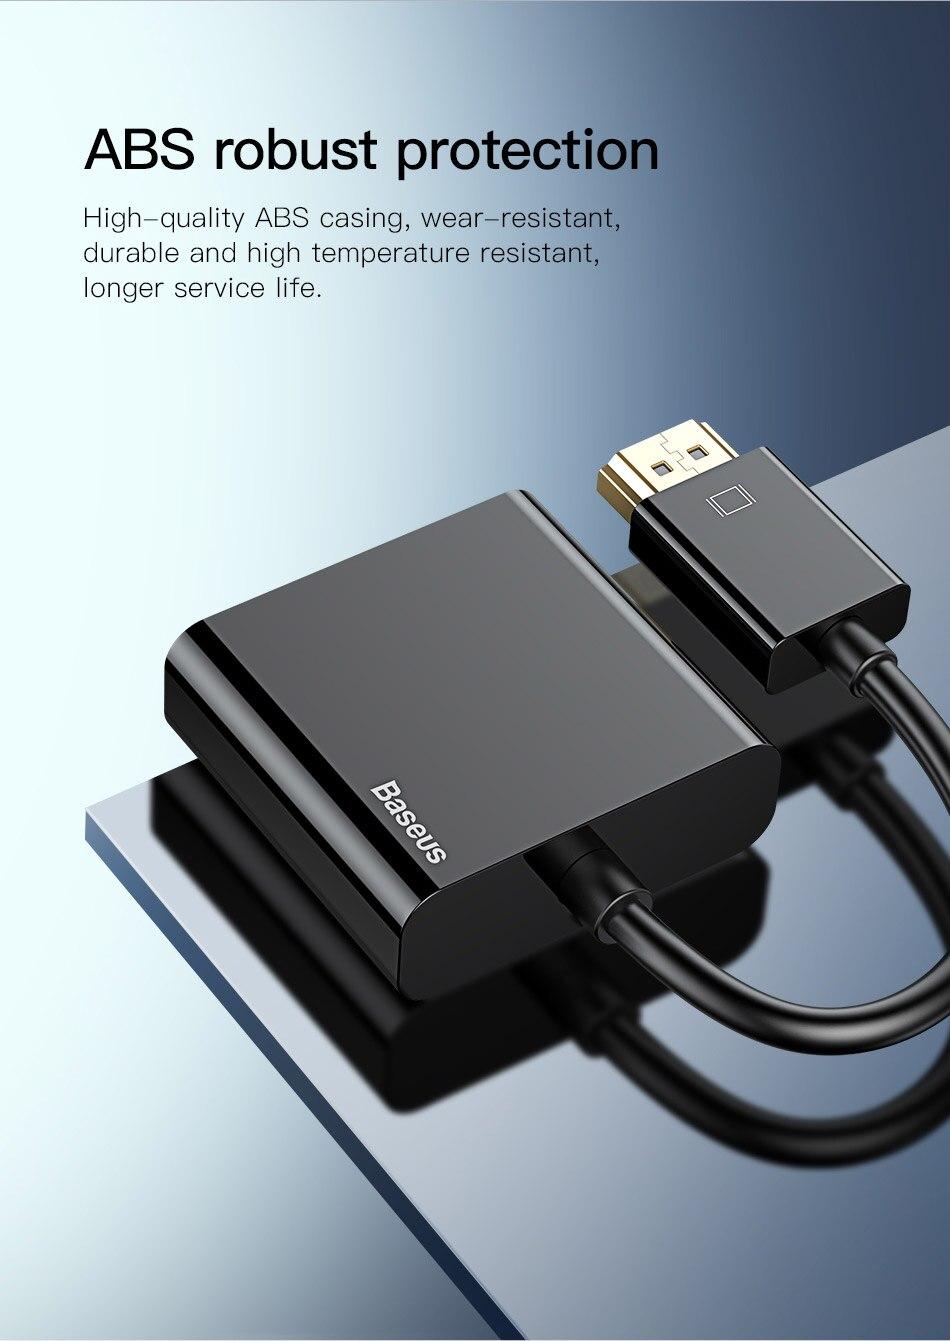 HTB1.4WGci6guuRkSmLyq6AulFXaM Baseus HDMI to VGA Cable HDMI VGA Adapter Digital HDMI to VGA Jack 3.5 mm Converter Video Aux Audio Splitter For Laptop PS4 TV